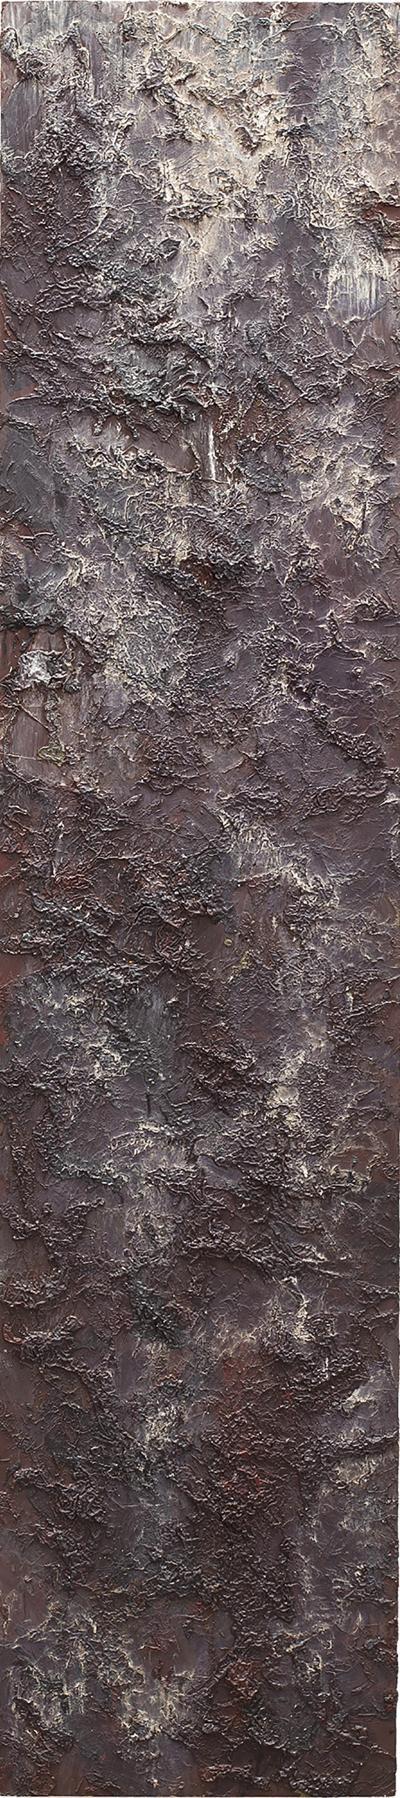 Joe Goode Waterfall Painting 005 Cantos 5